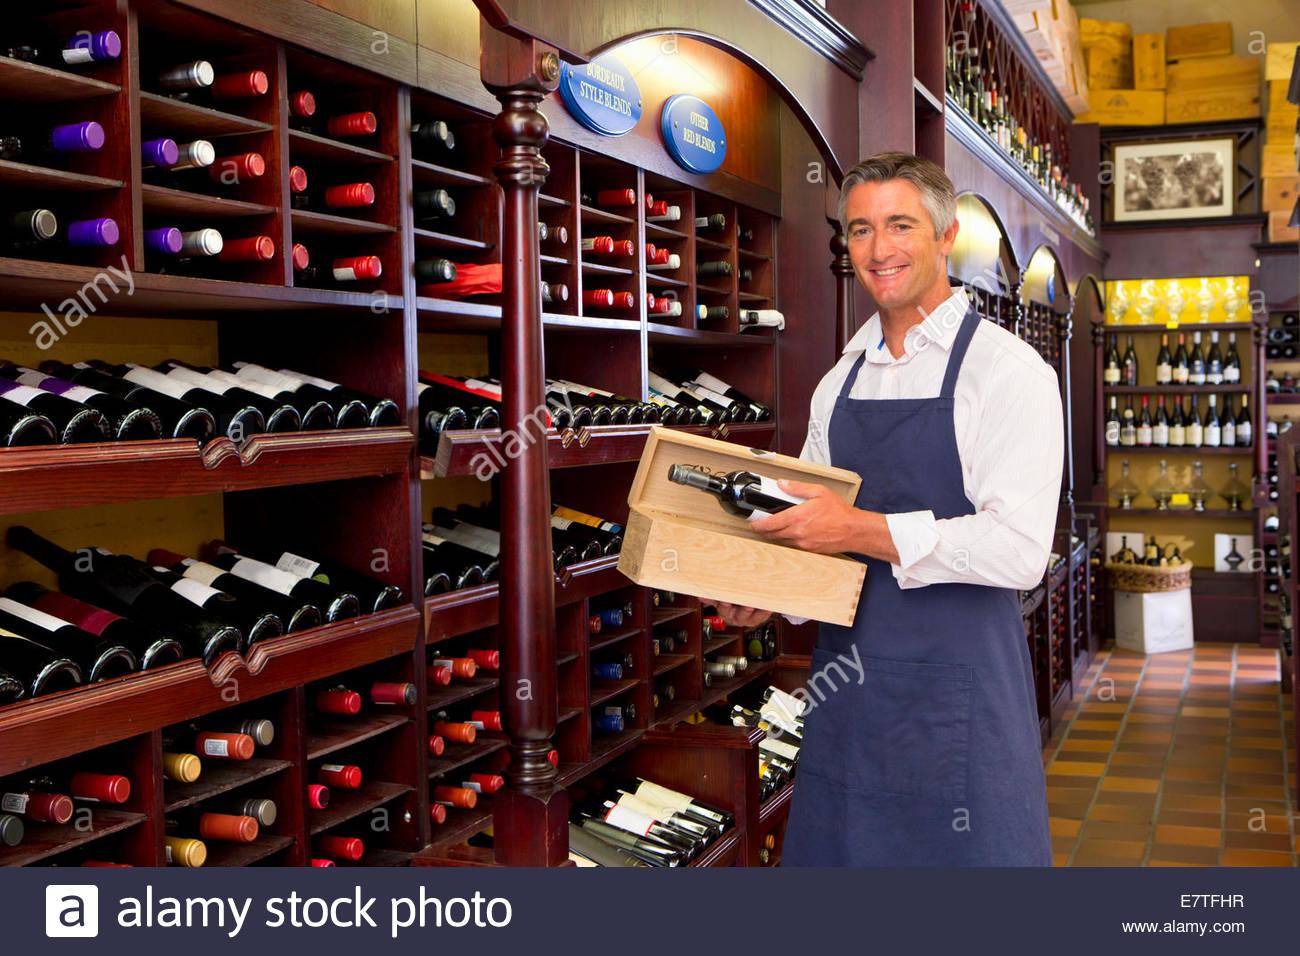 Worker stocking bottles in wine shop - Stock Image